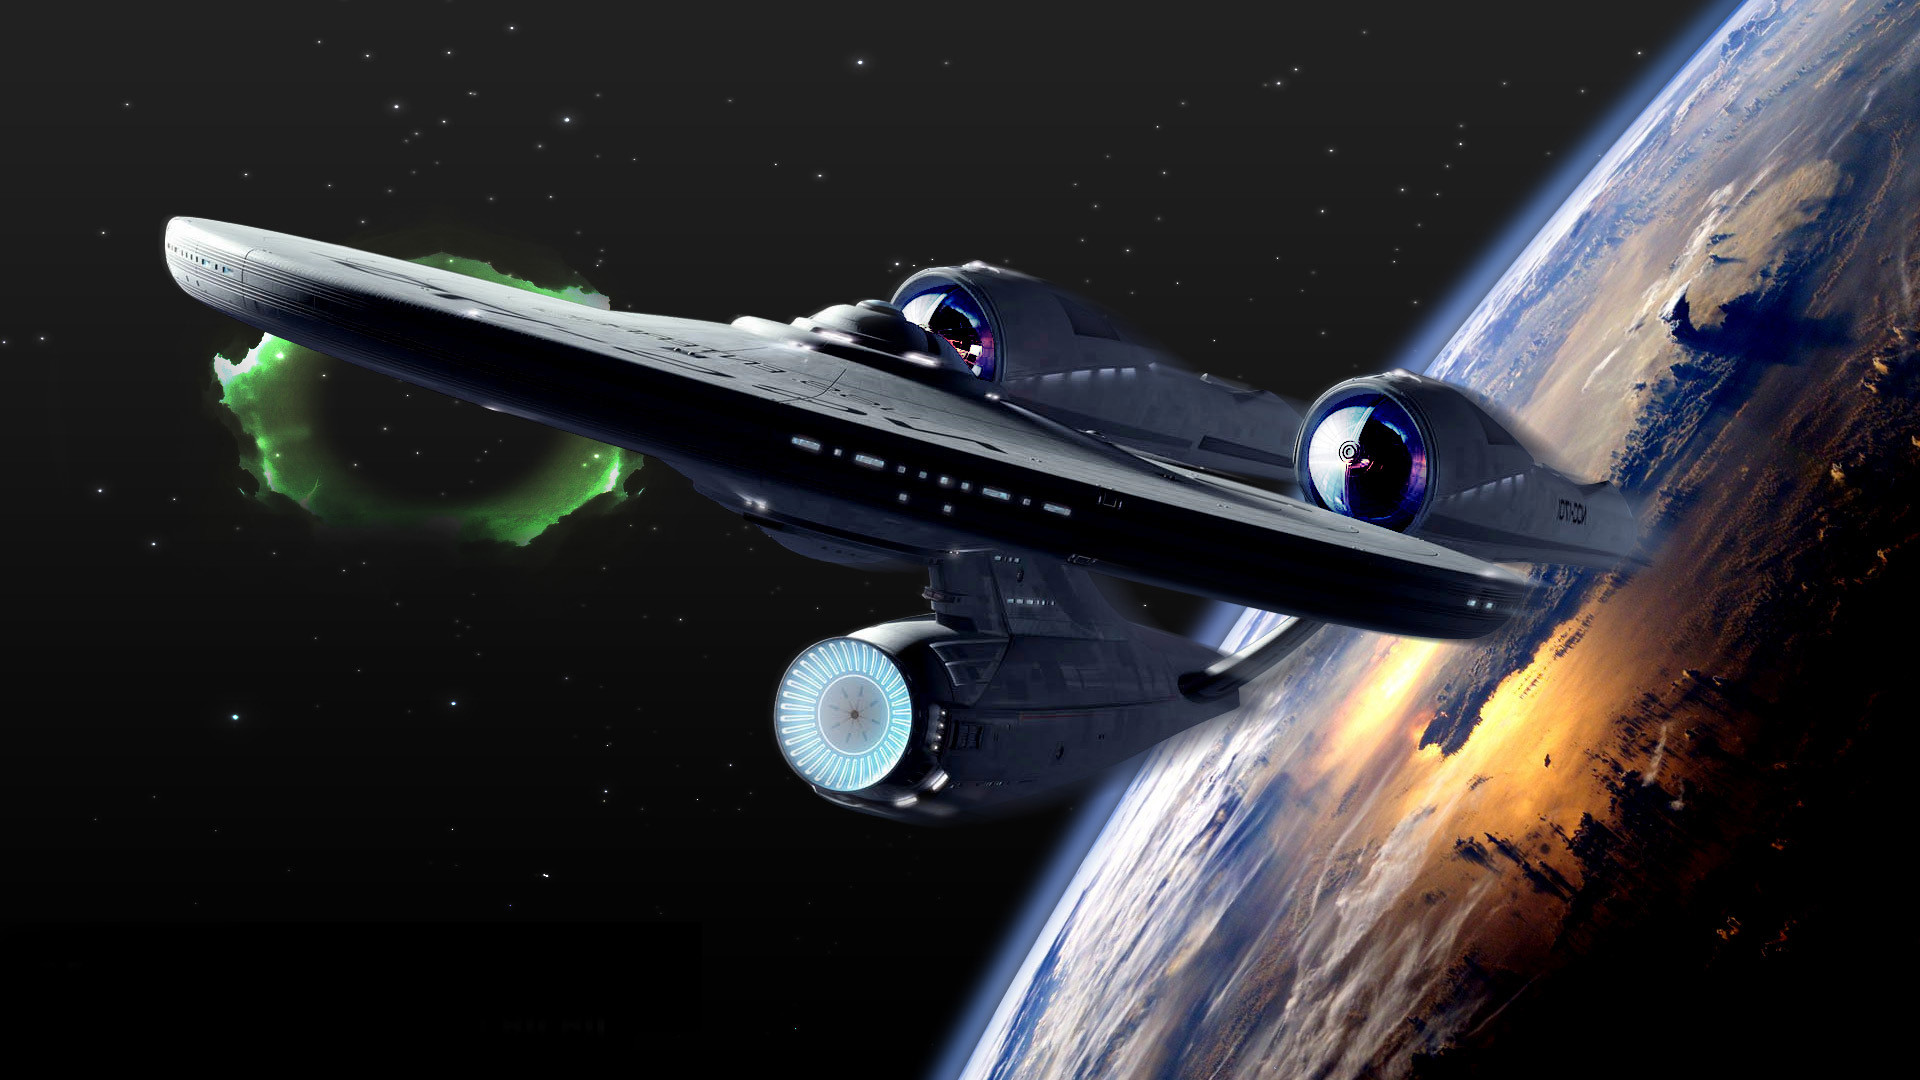 star trek enterprise wallpaper hd (70+ images)